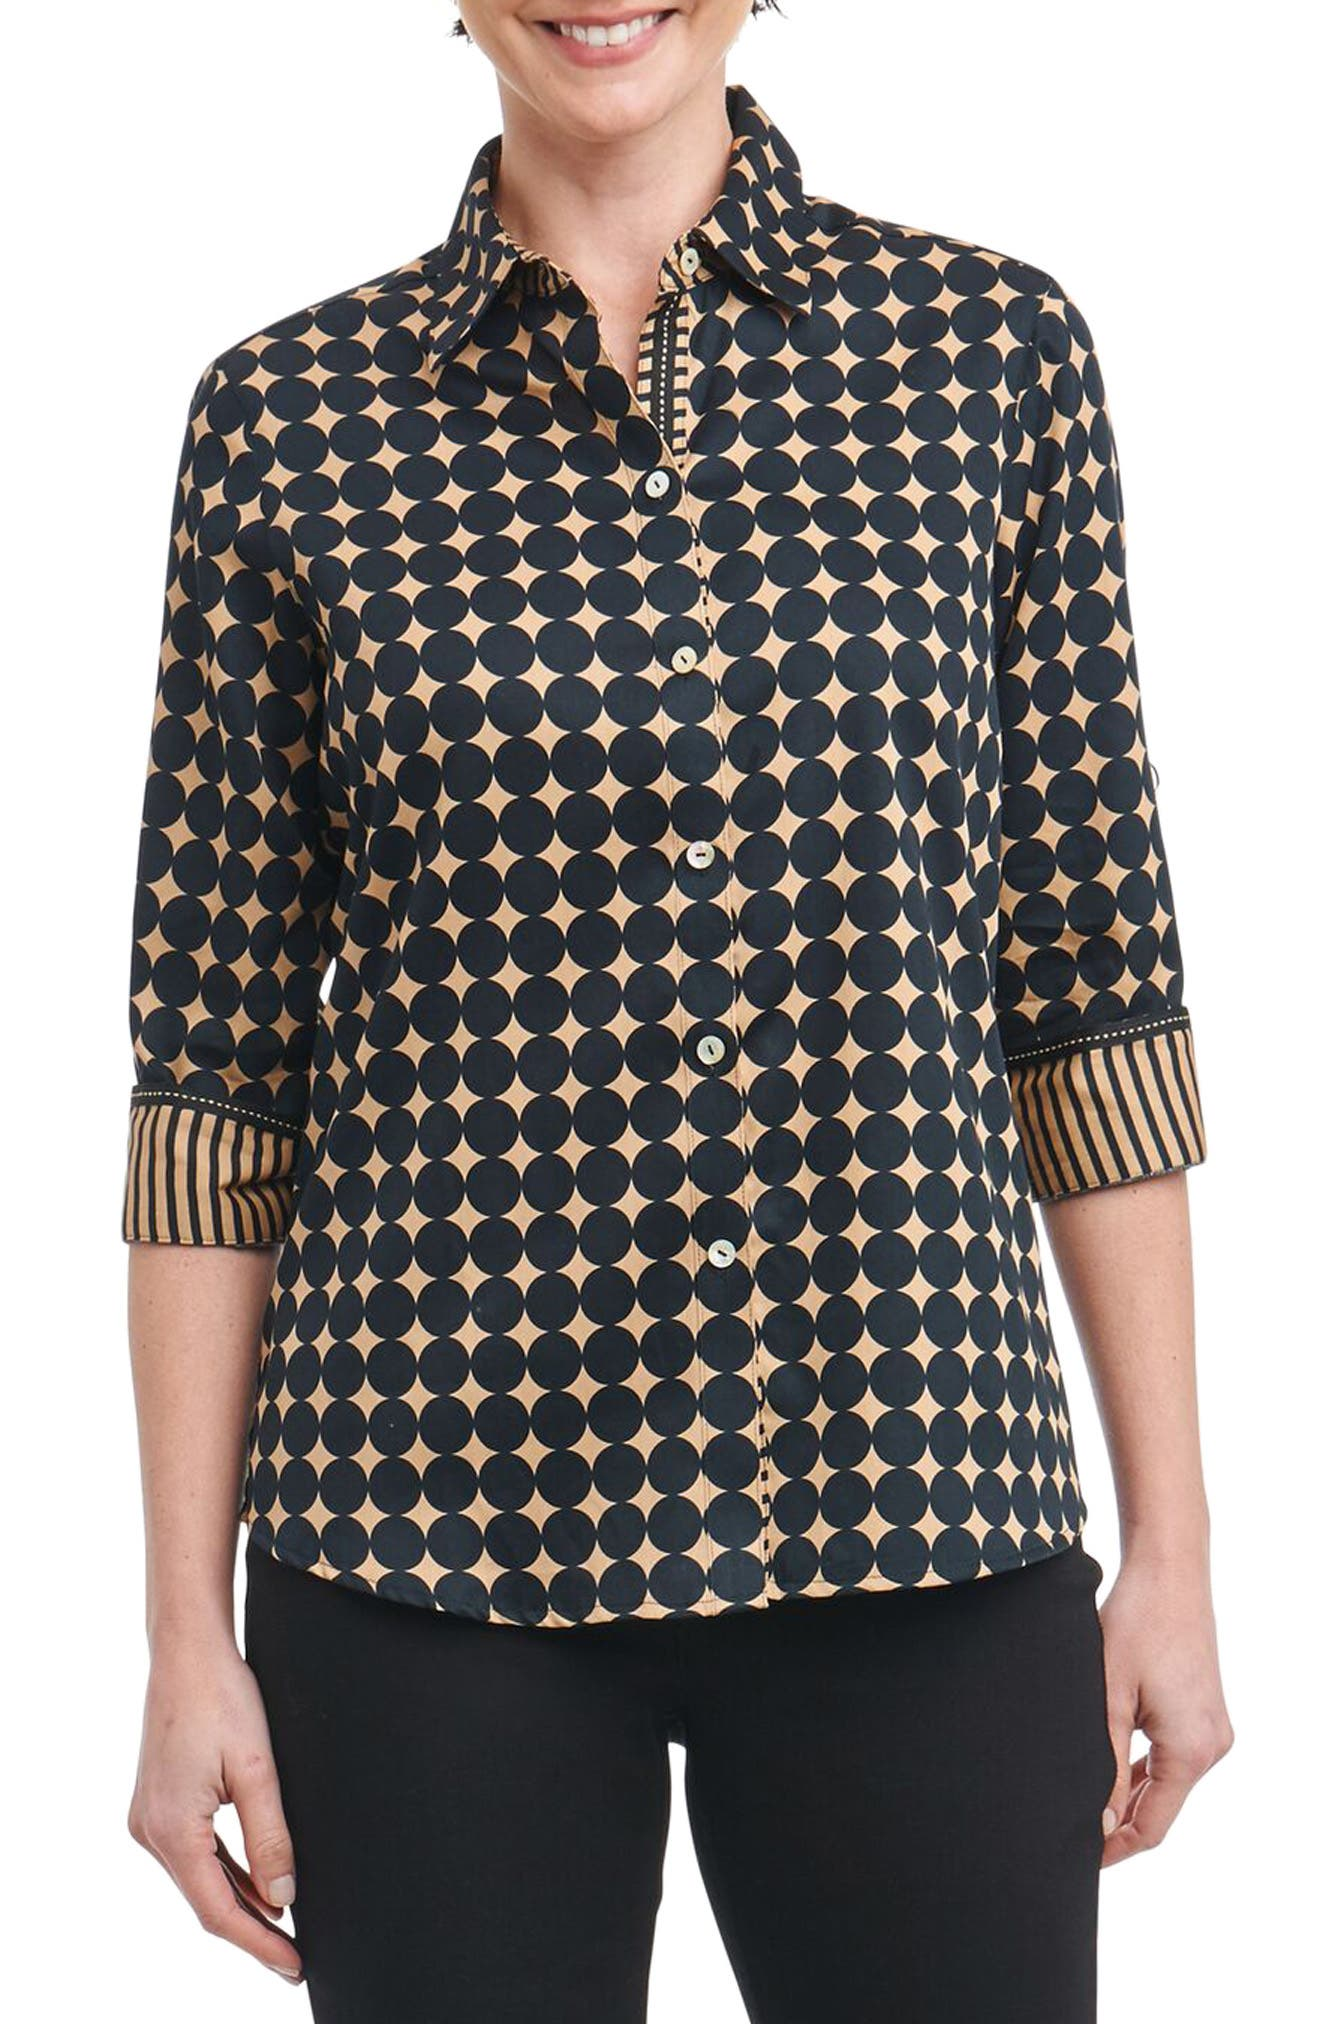 Ava Non-Iron Dot Print Cotton Shirt,                             Main thumbnail 1, color,